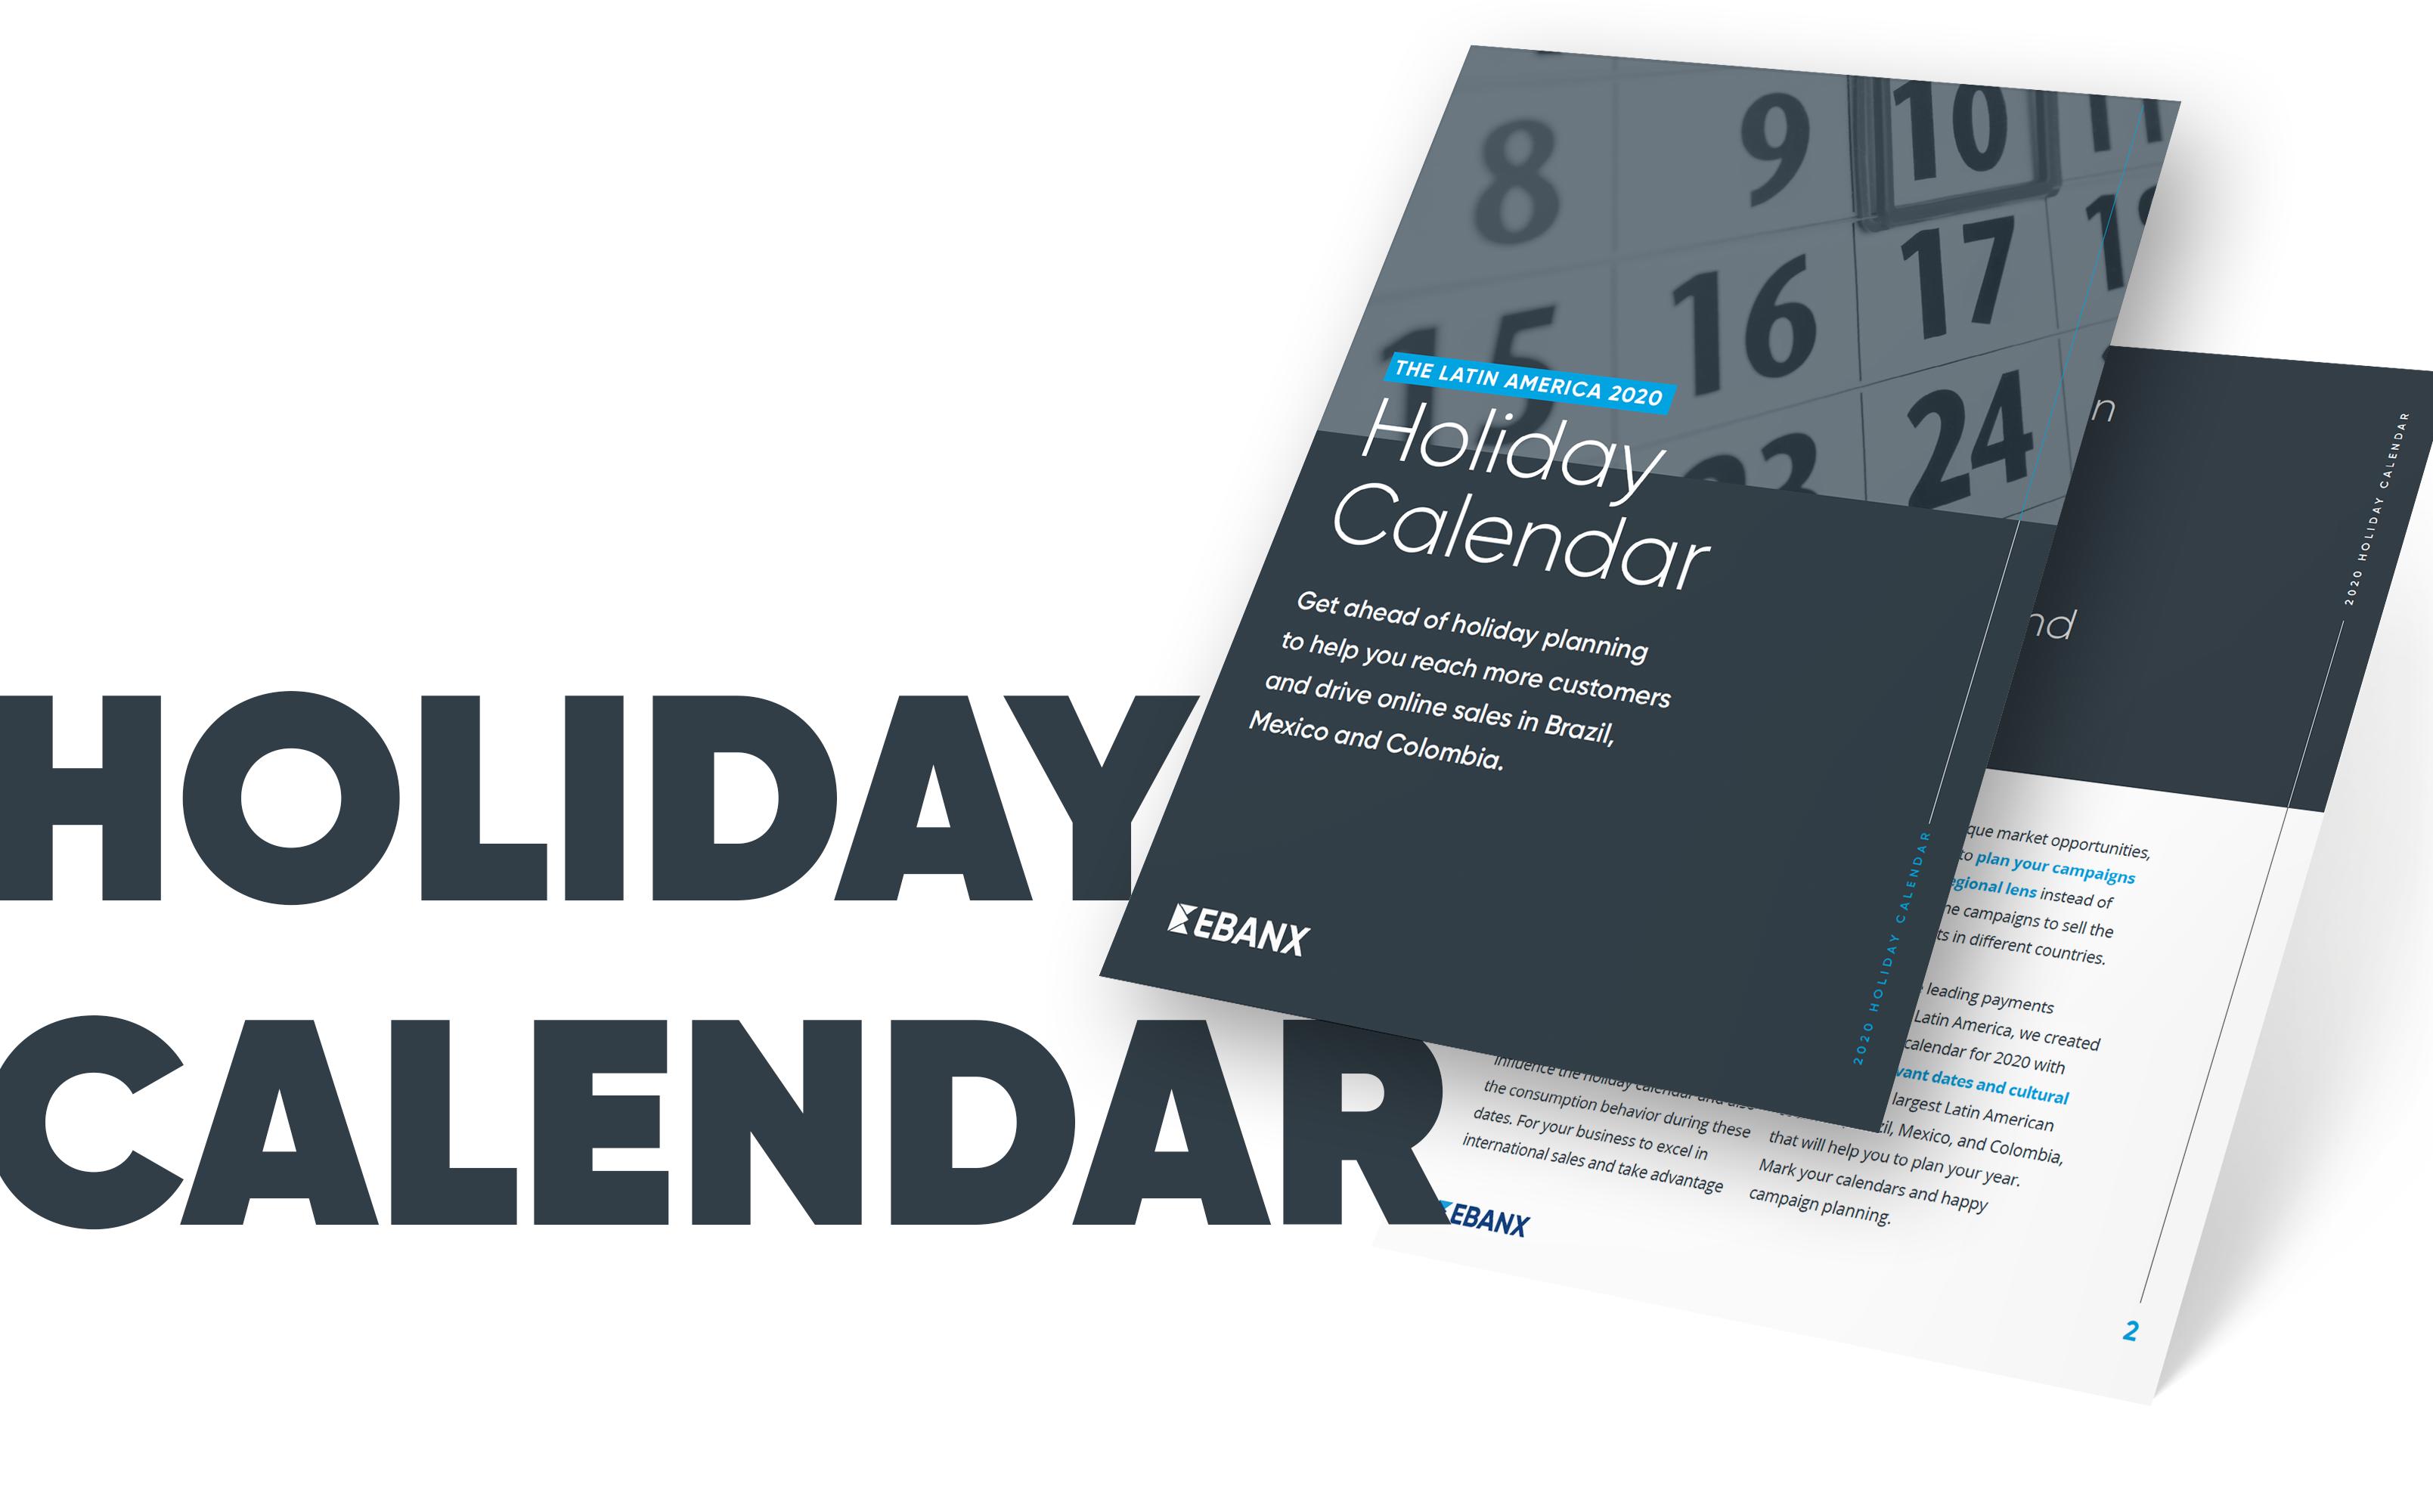 HolidayCalendar-1